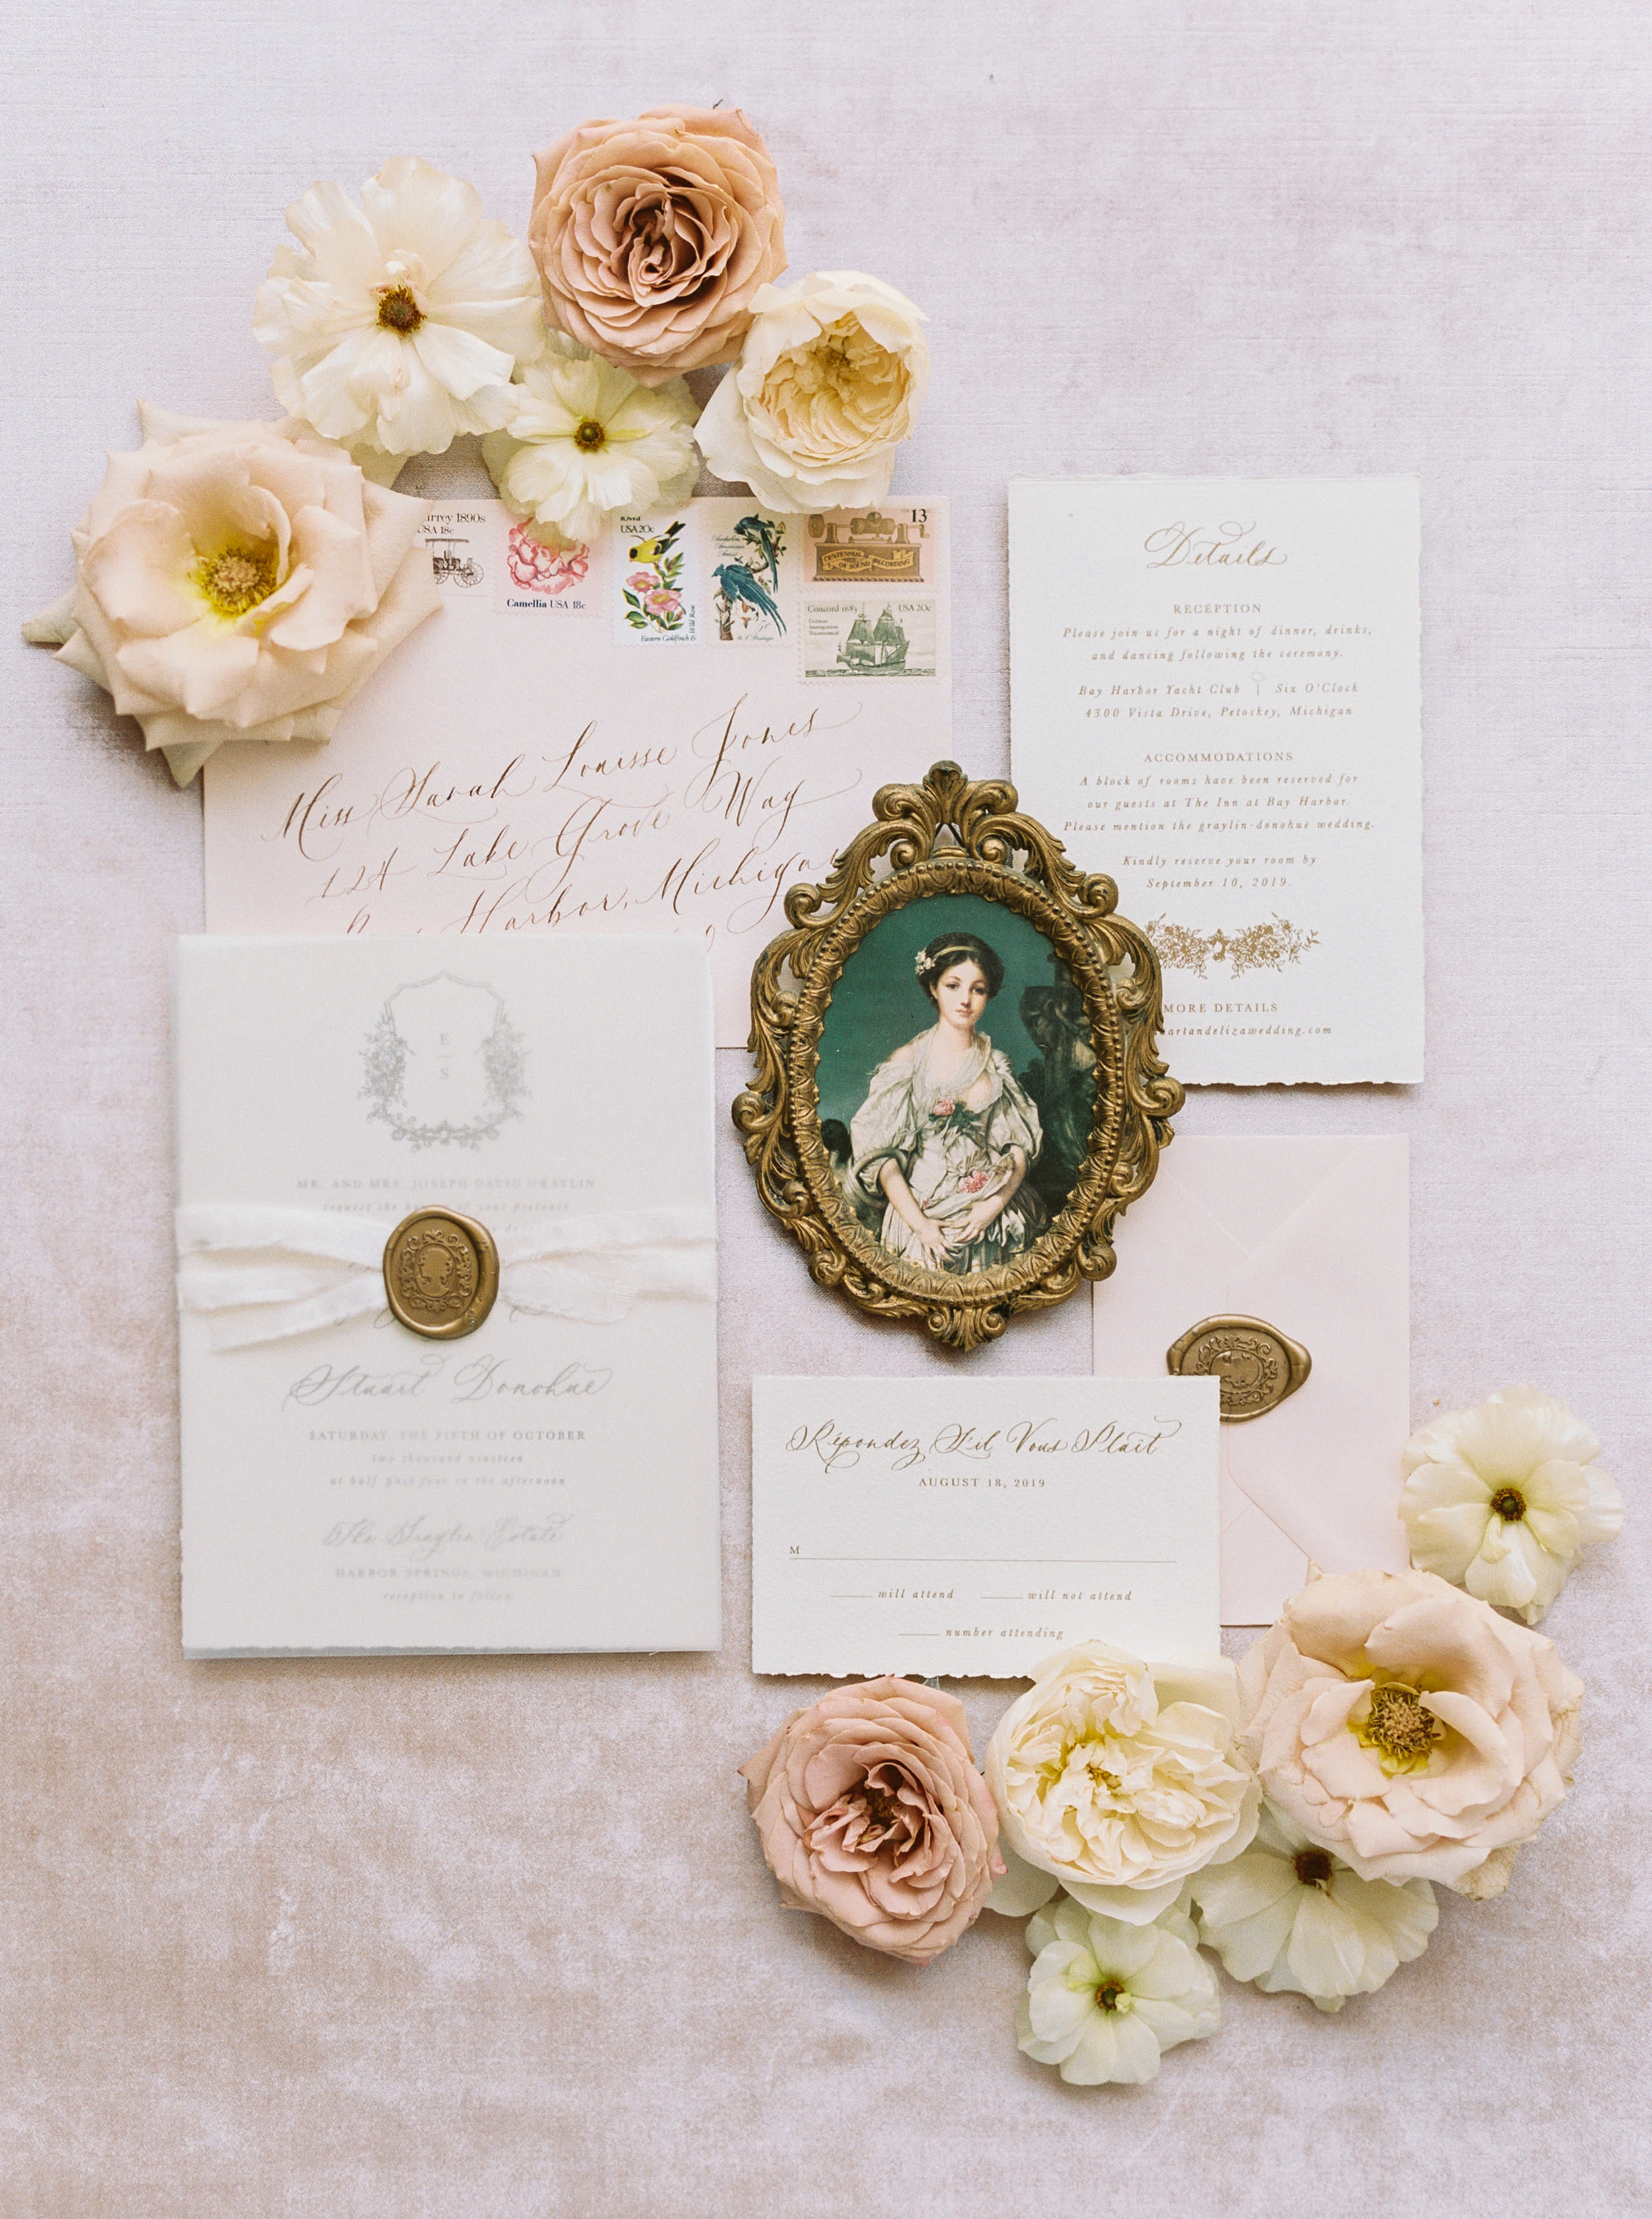 Romantic semi-custom wedding invitation suite. Antique gold wax seals, silk ribbon, vellum overlay, gold calligraphy, and blush envelopes.